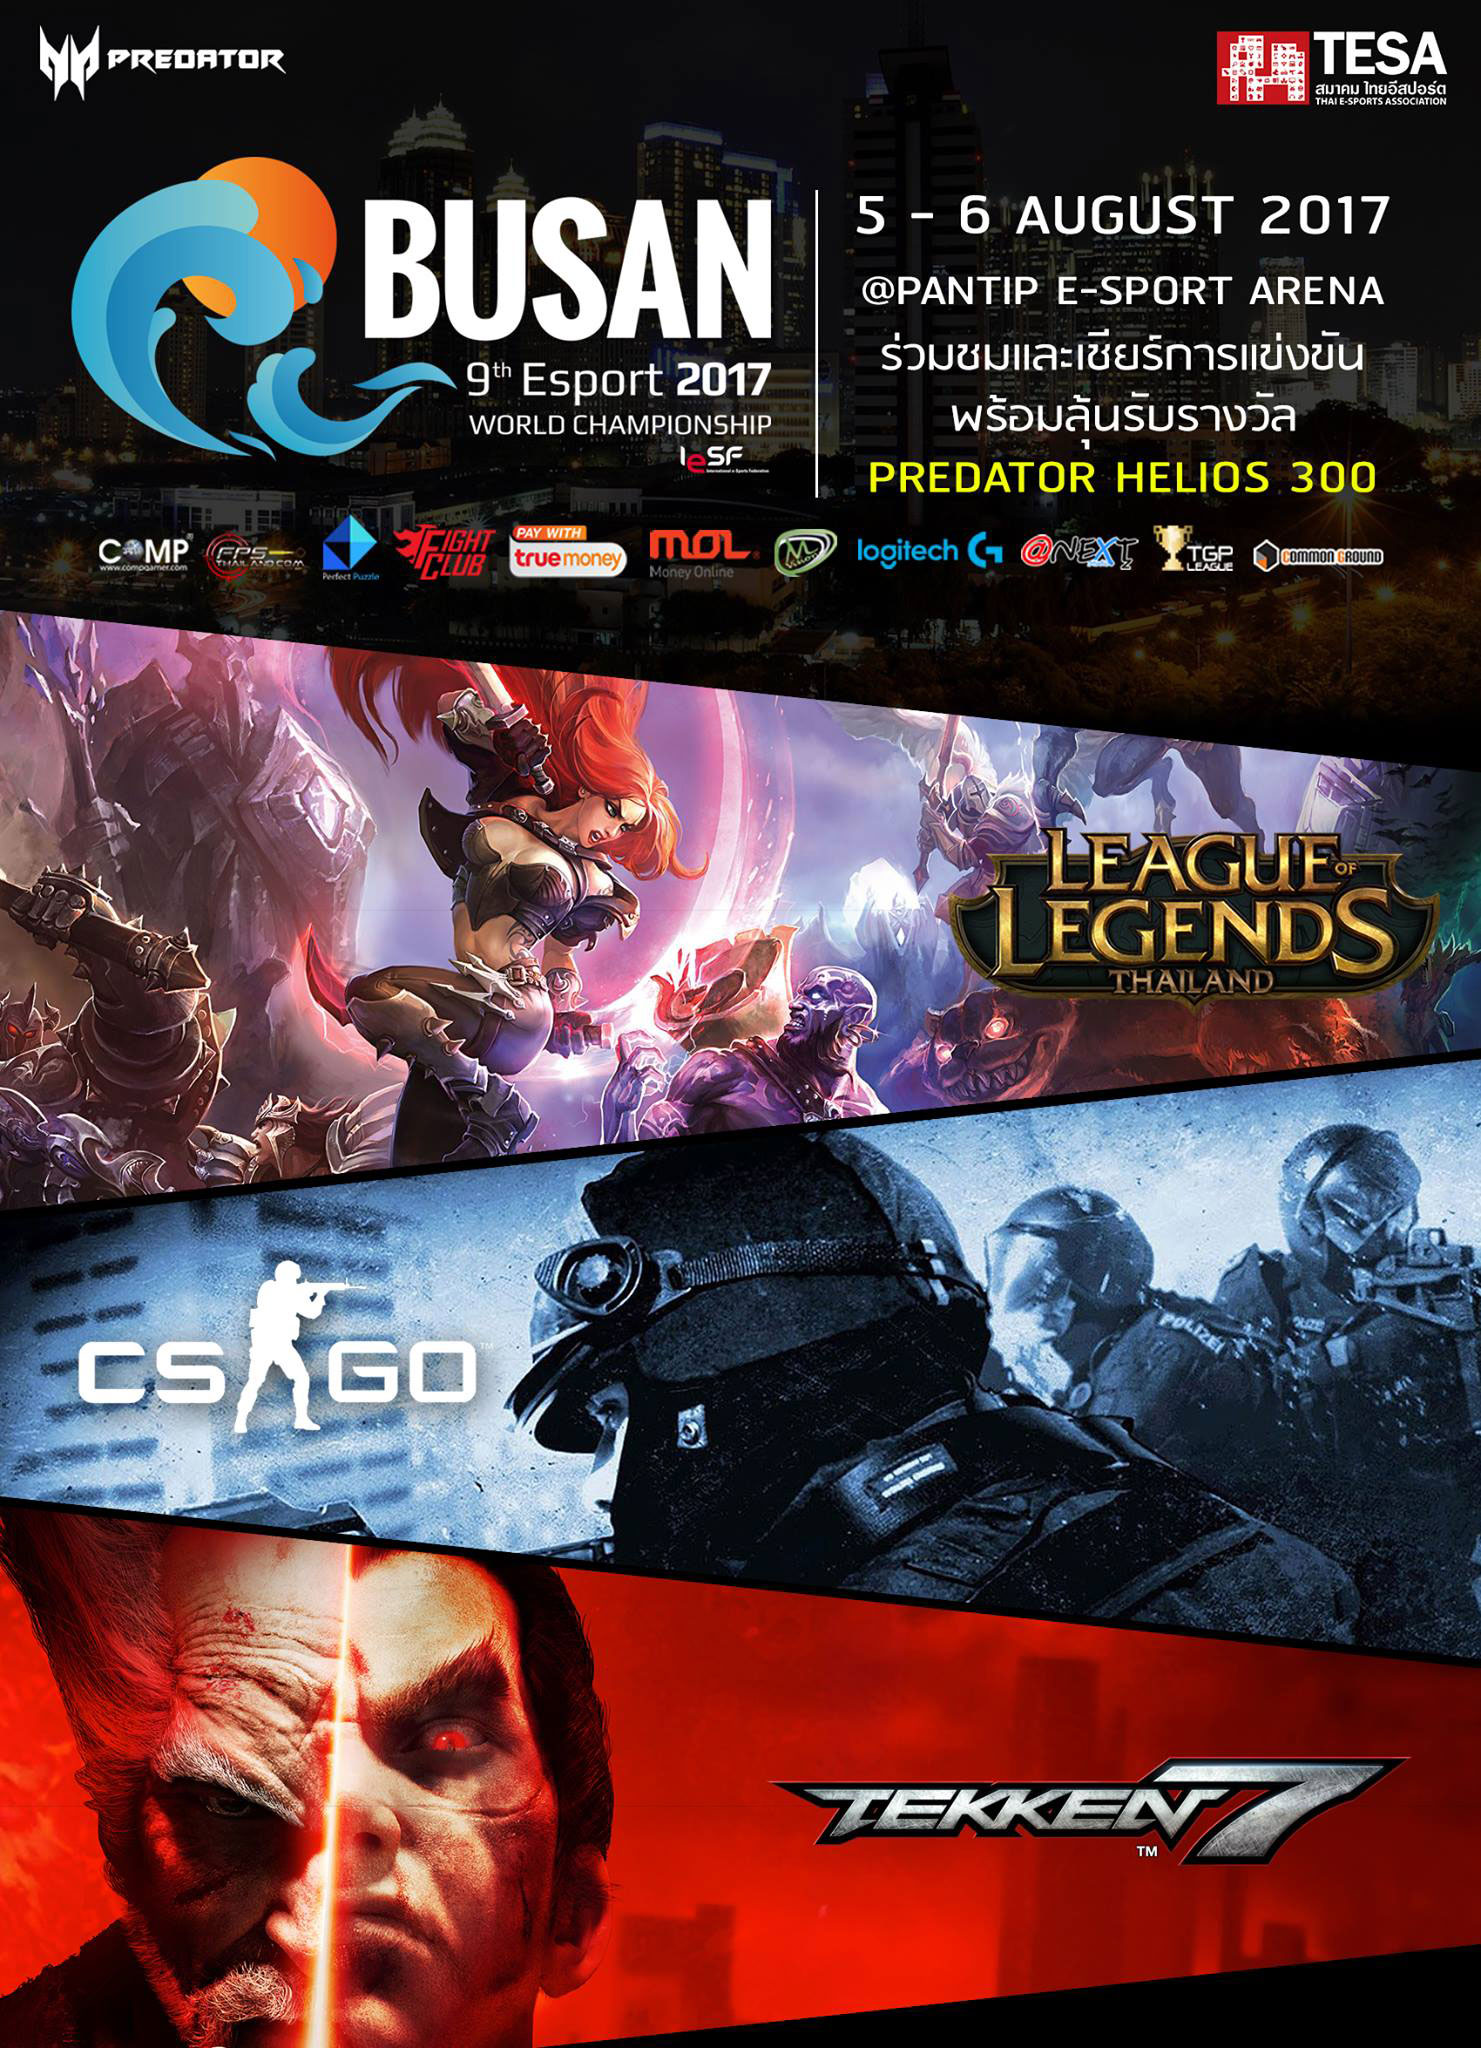 BUSAN 9th E-Sport 2017 World Championship